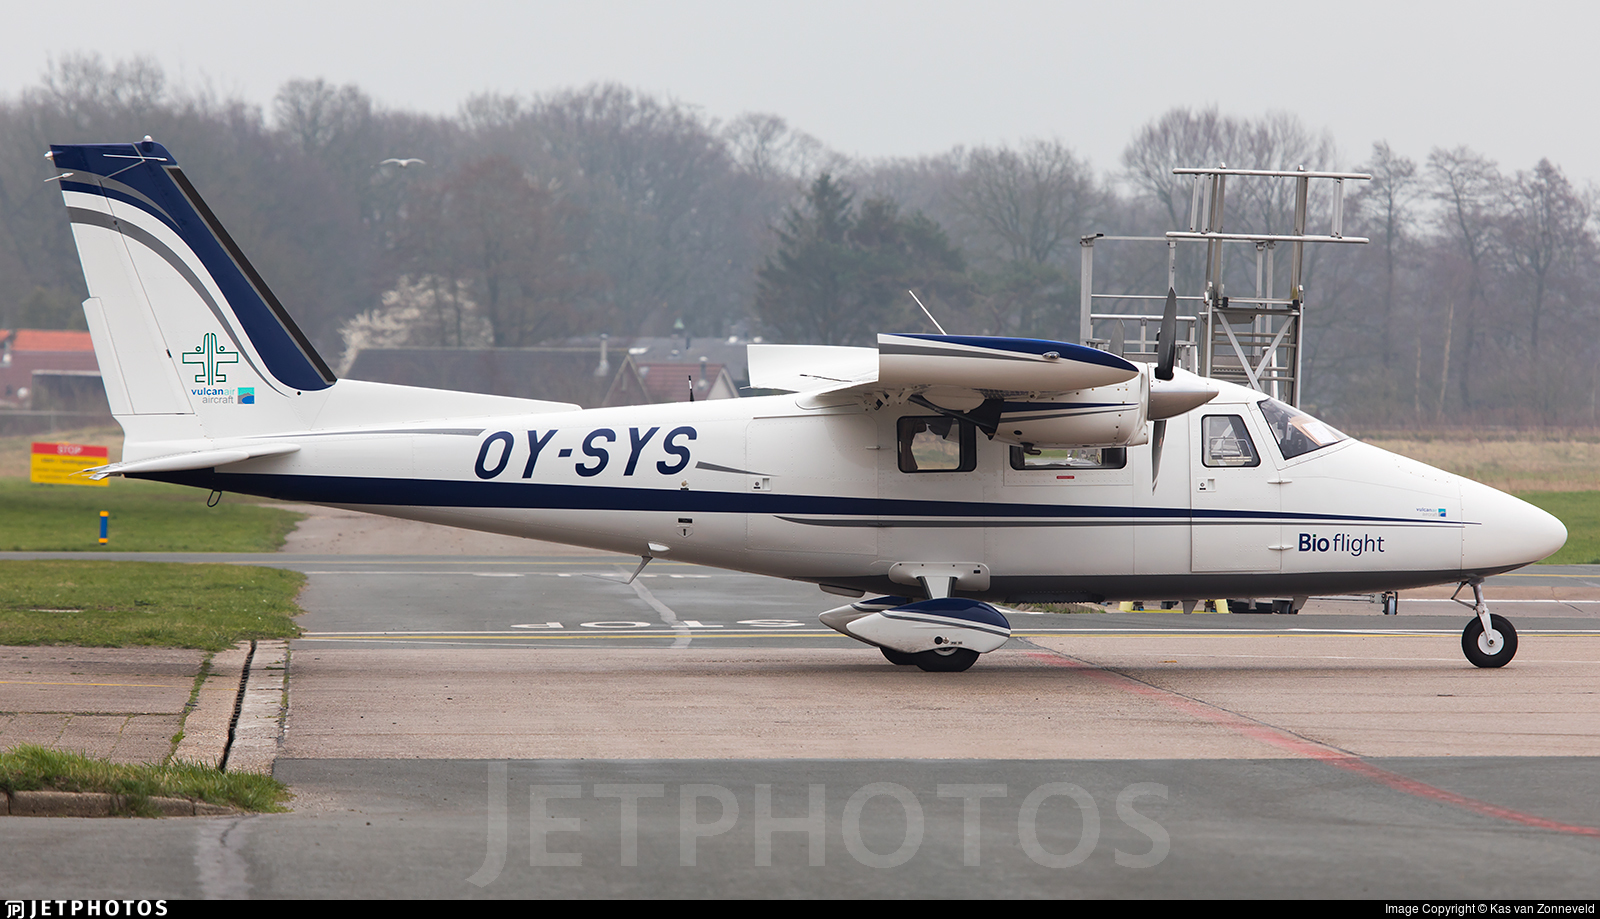 OY-SYS - Vulcanair P-68C - Bio flight